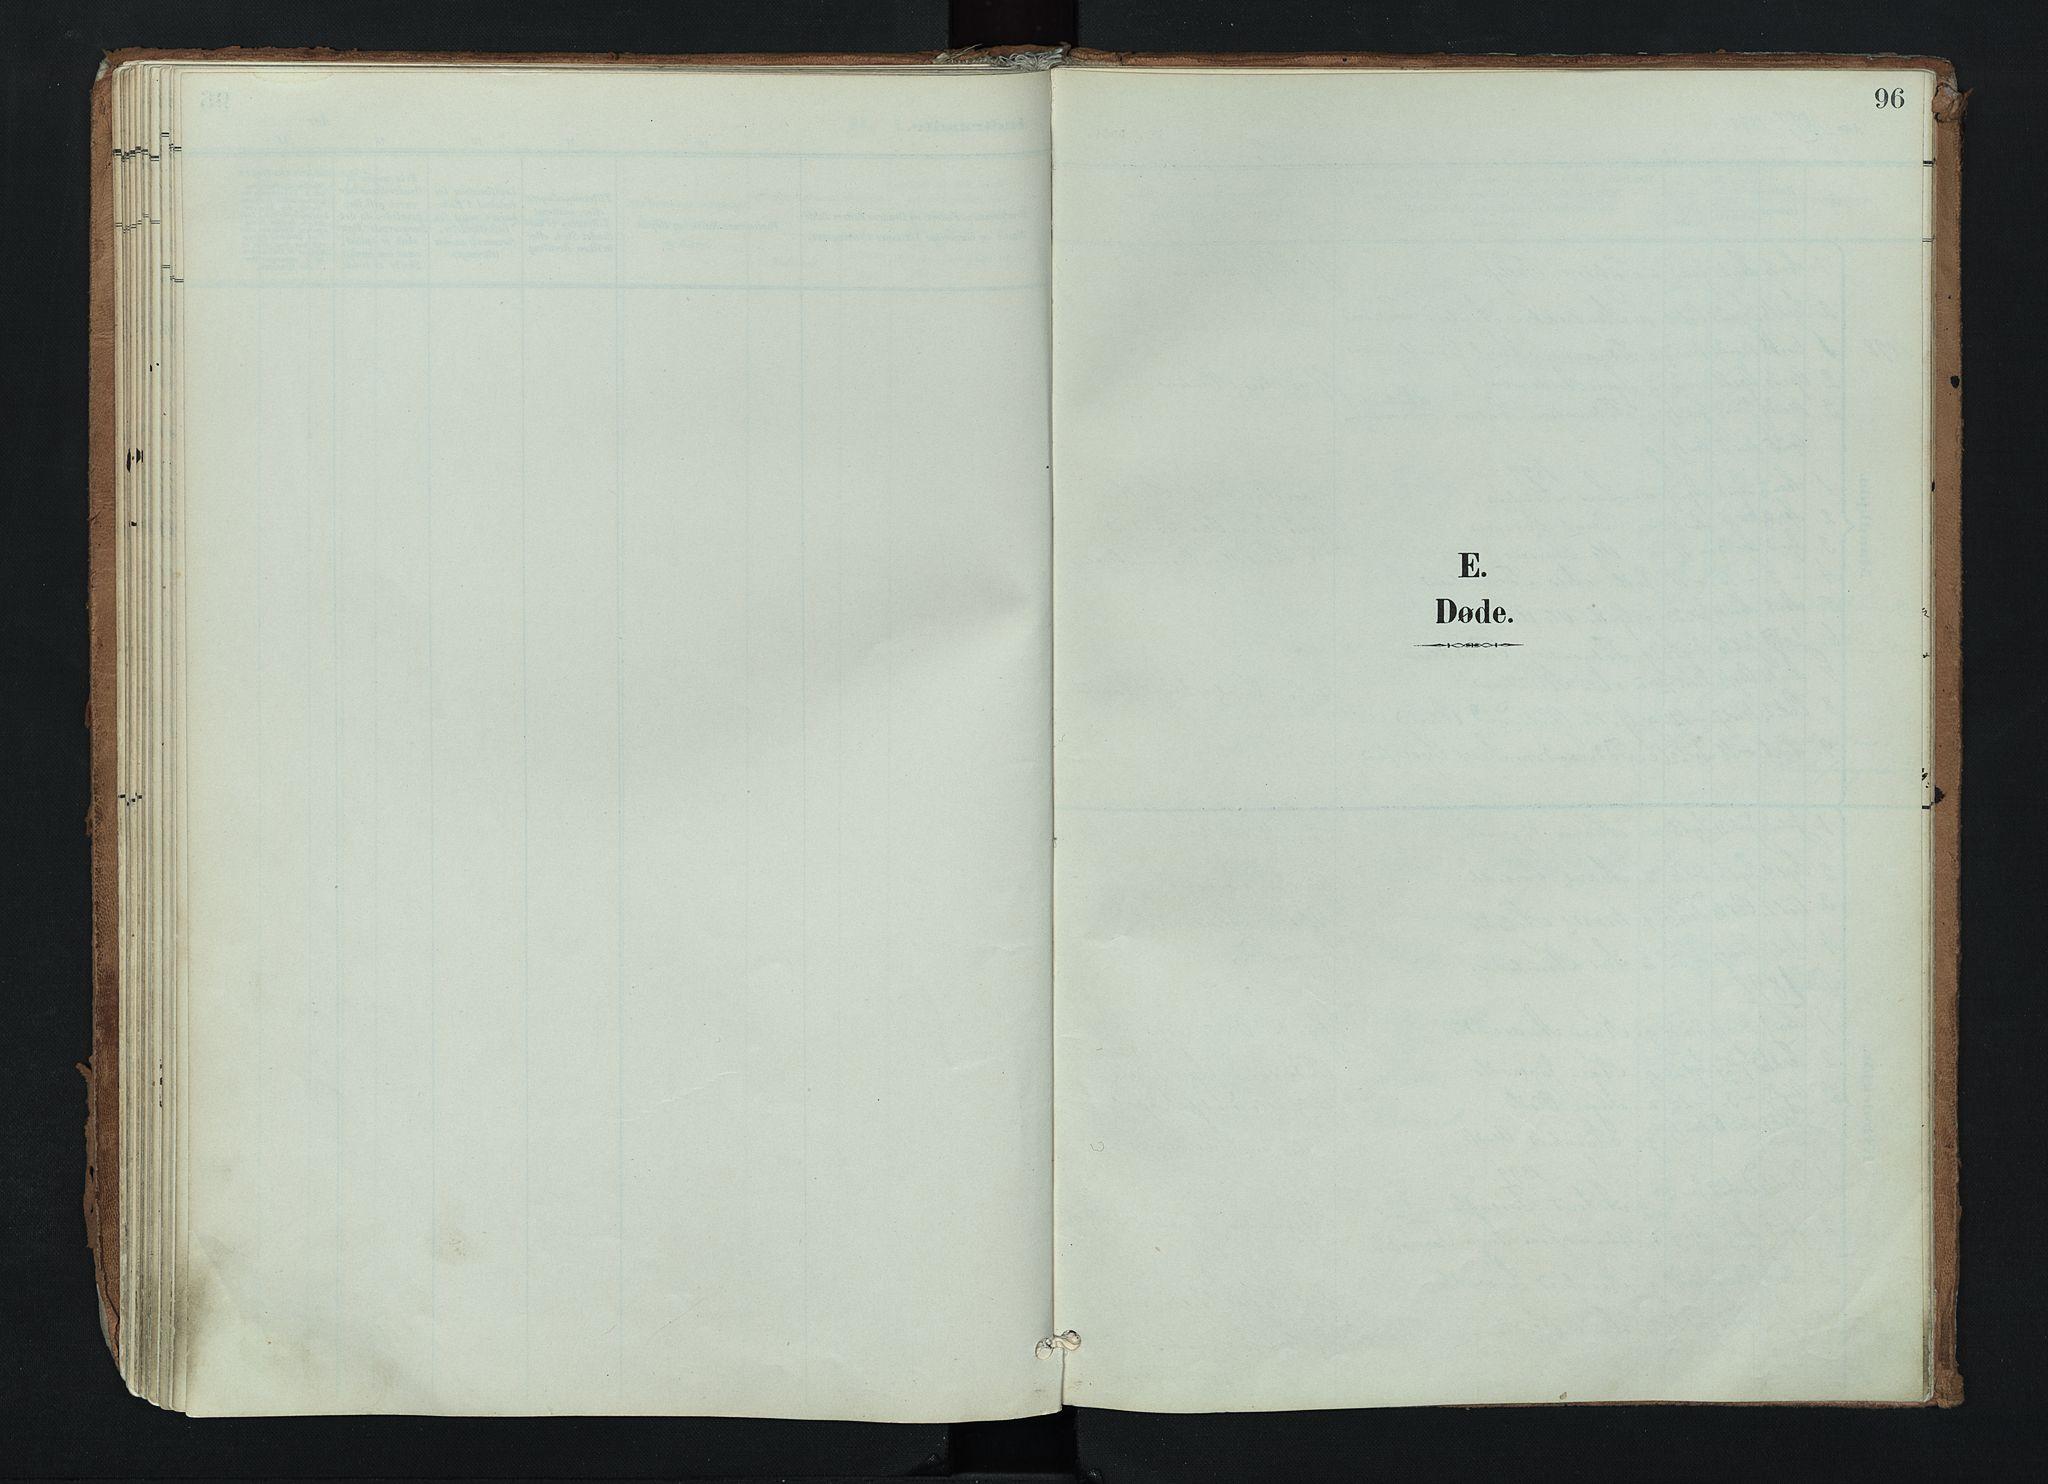 SAH, Nord-Aurdal prestekontor, Ministerialbok nr. 17, 1897-1926, s. 96